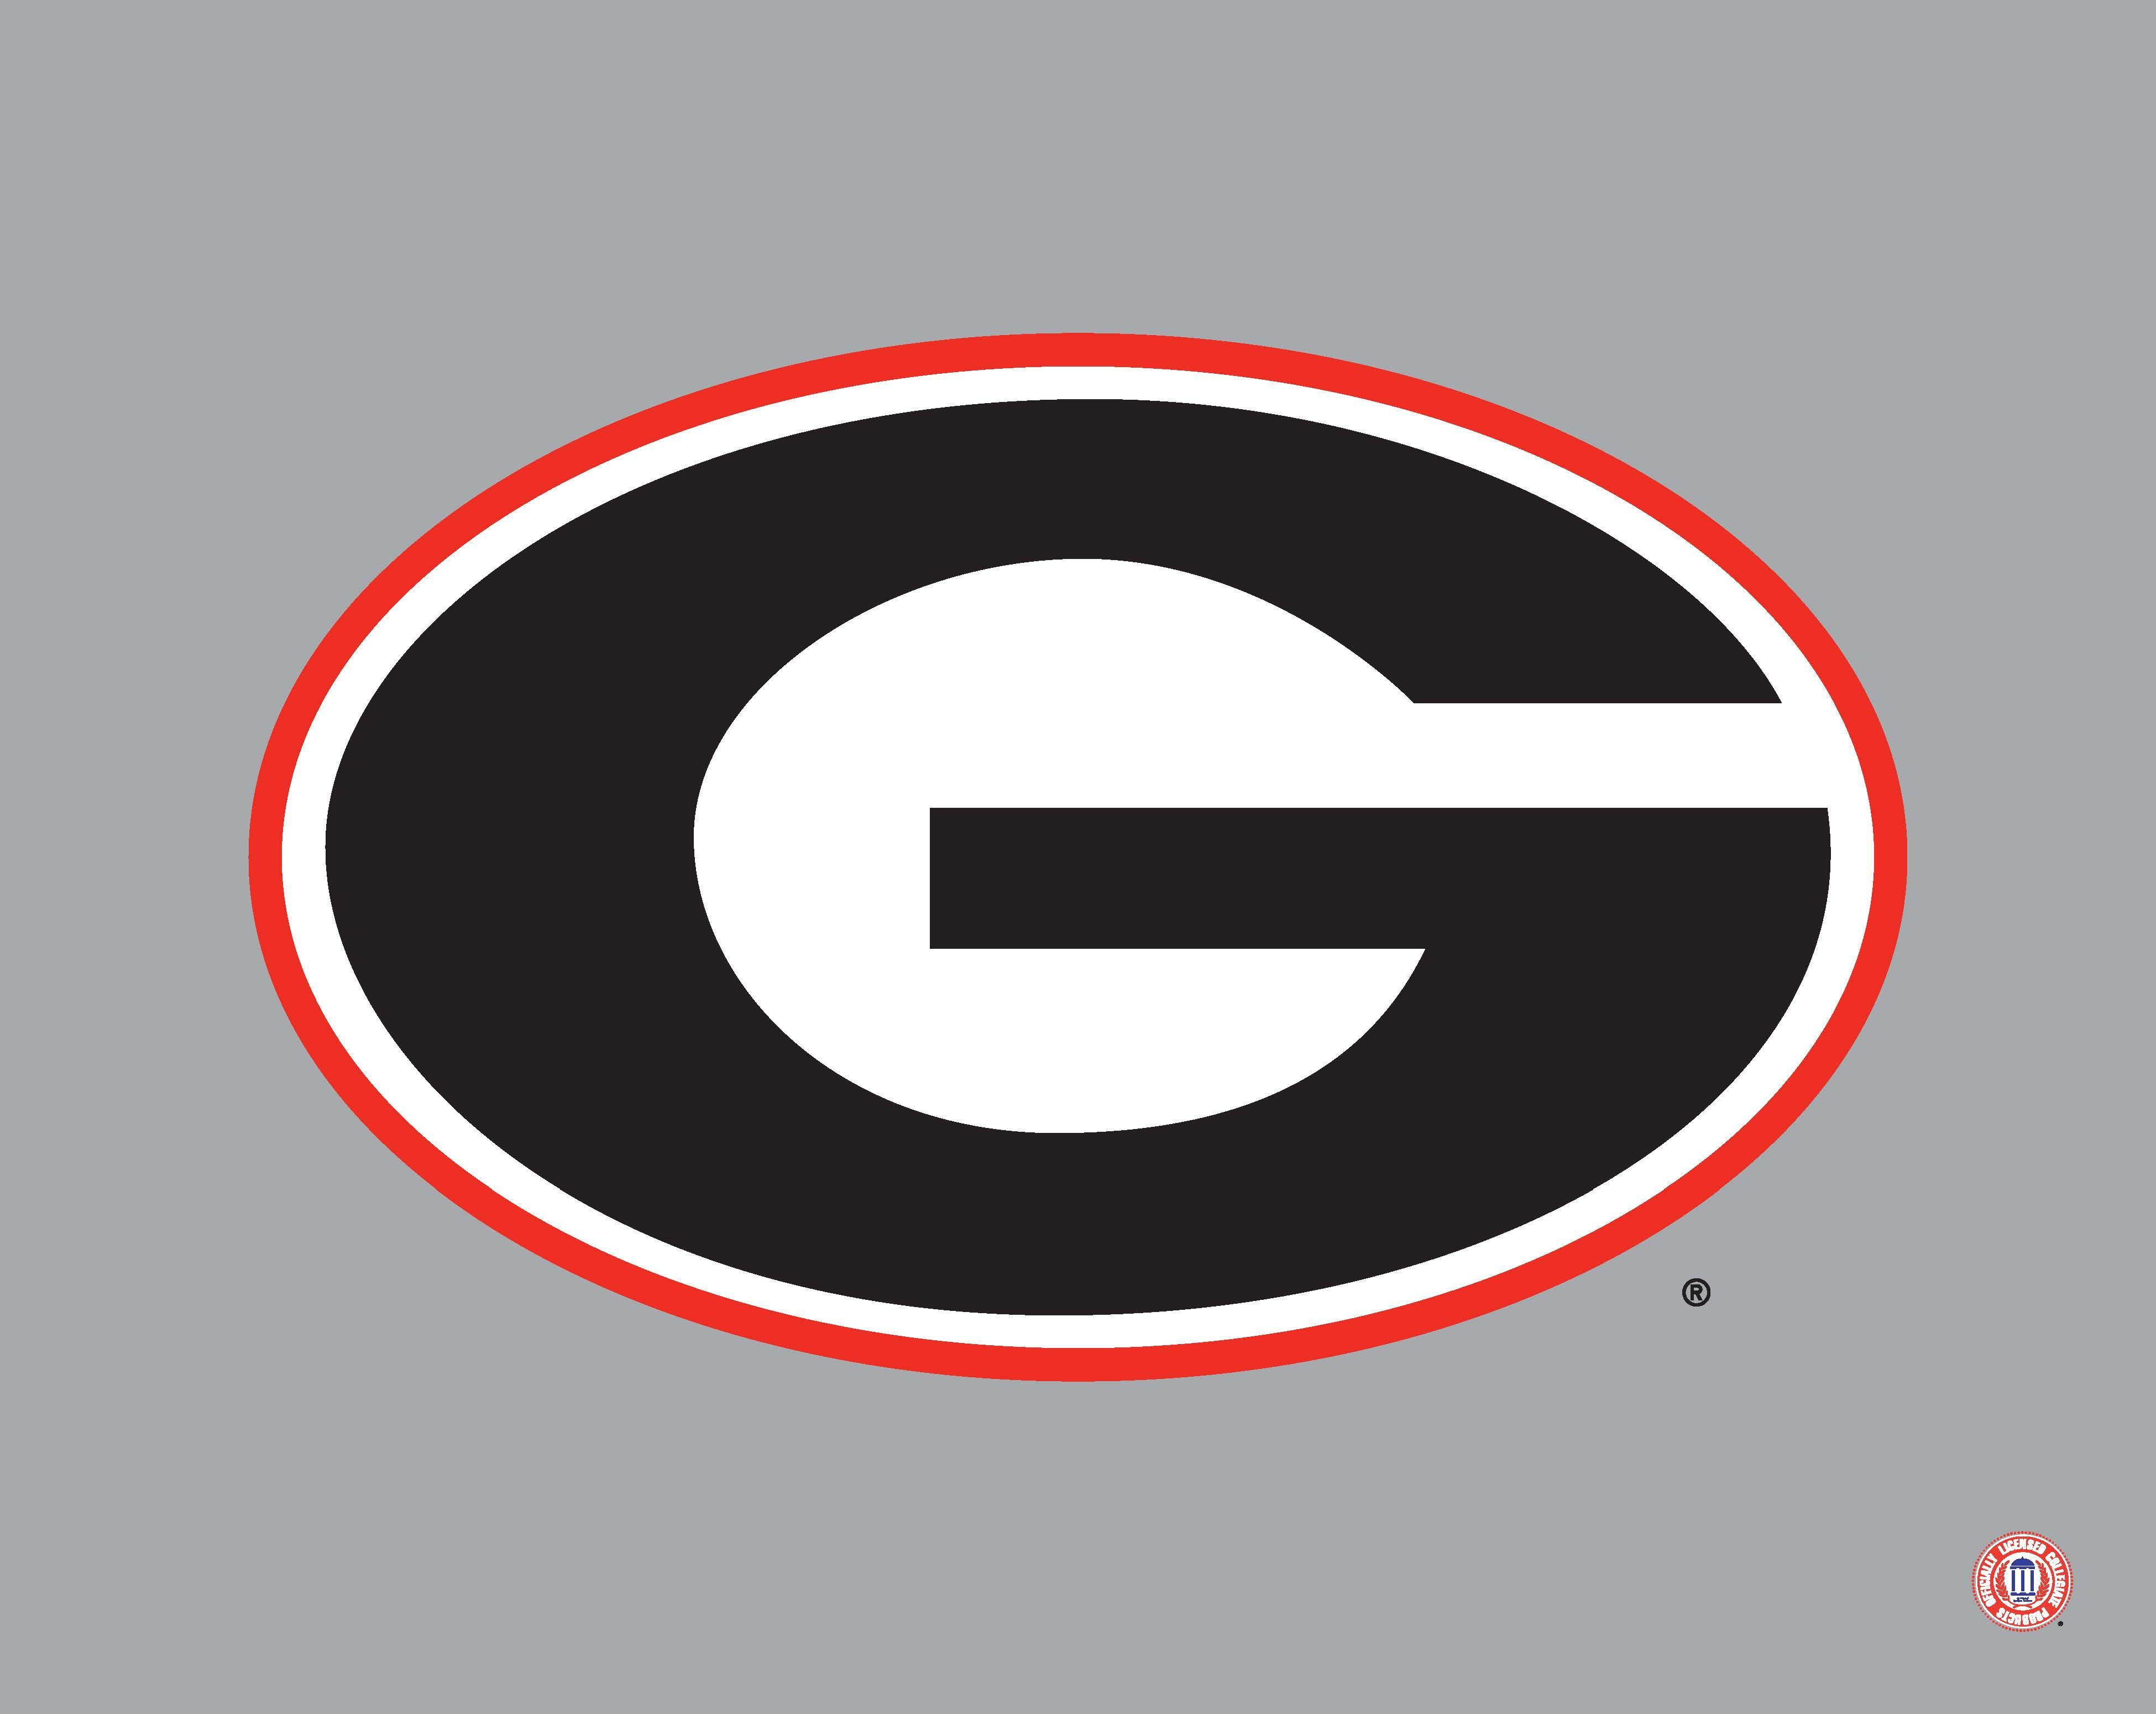 Georgia Bulldogs Logo College Sports Georgia Bulldogs Logos